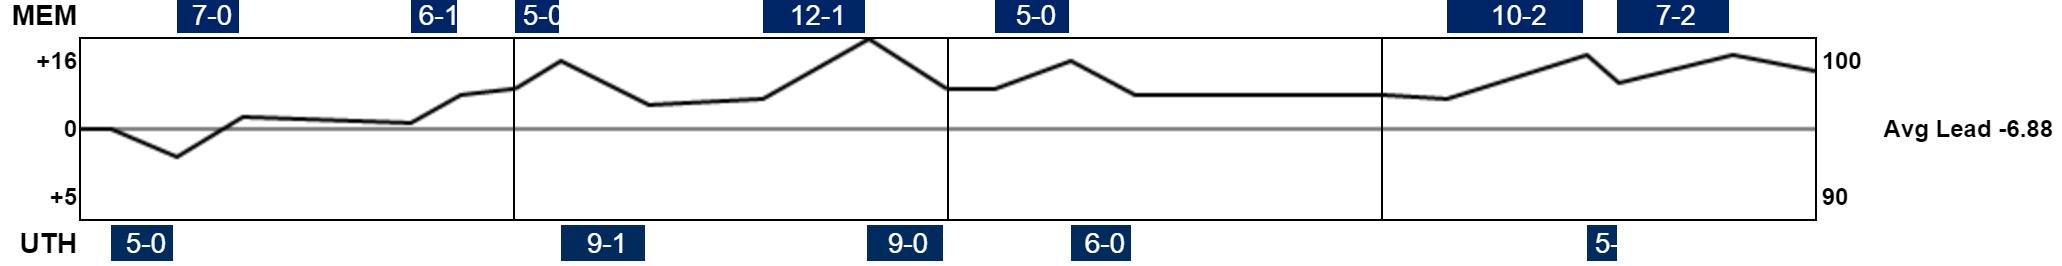 Jazz/Grizzlies scoreline